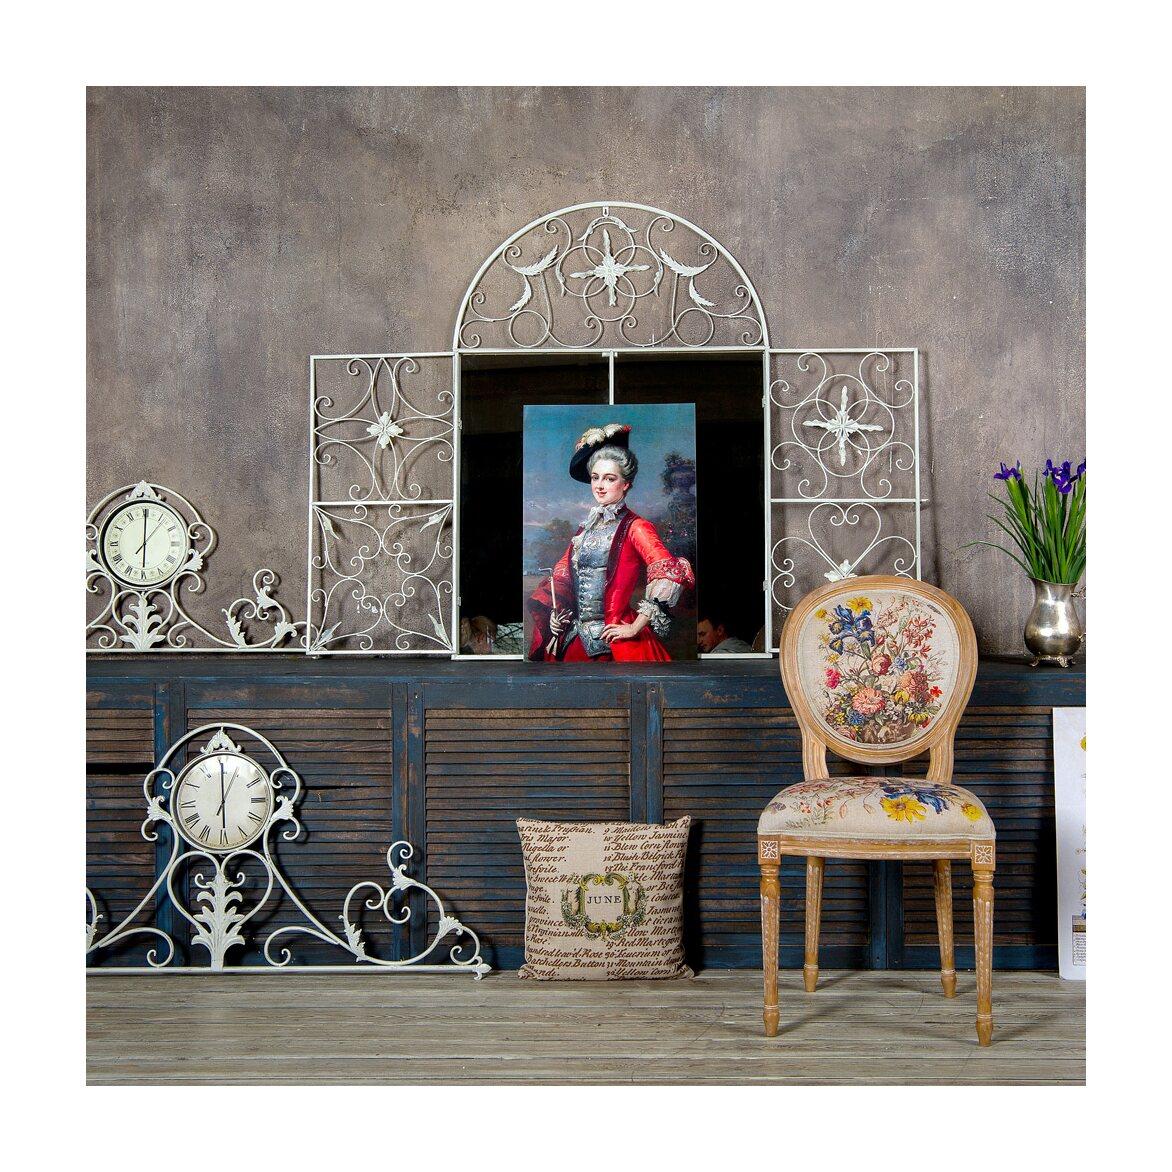 Настенное зеркало «Бизе» (белый антик) 4 | Настенные зеркала Kingsby